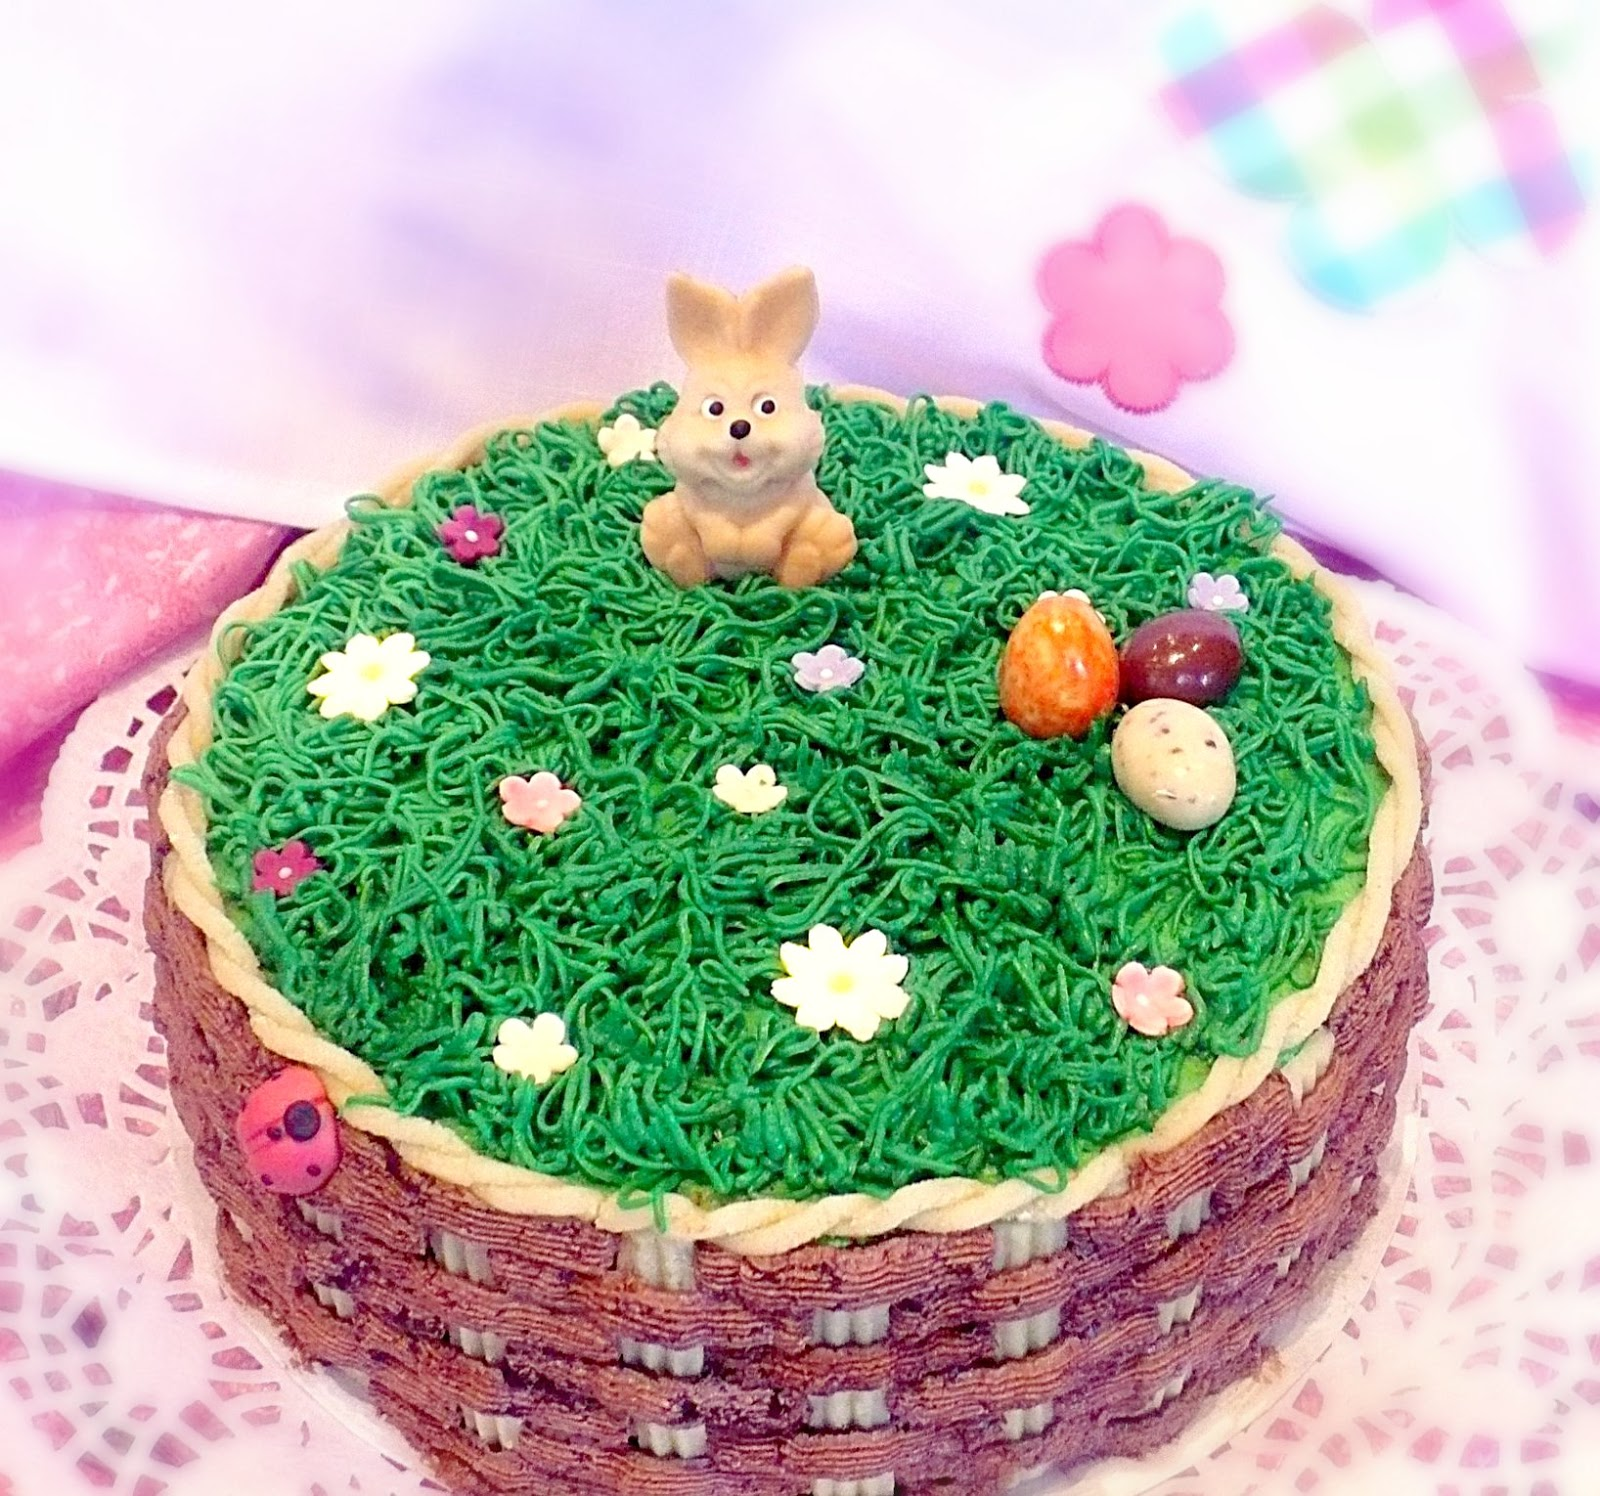 húsvéti torta képek Juditka konyhája: HÚSVÉTI TORTA ÉS BARI húsvéti torta képek